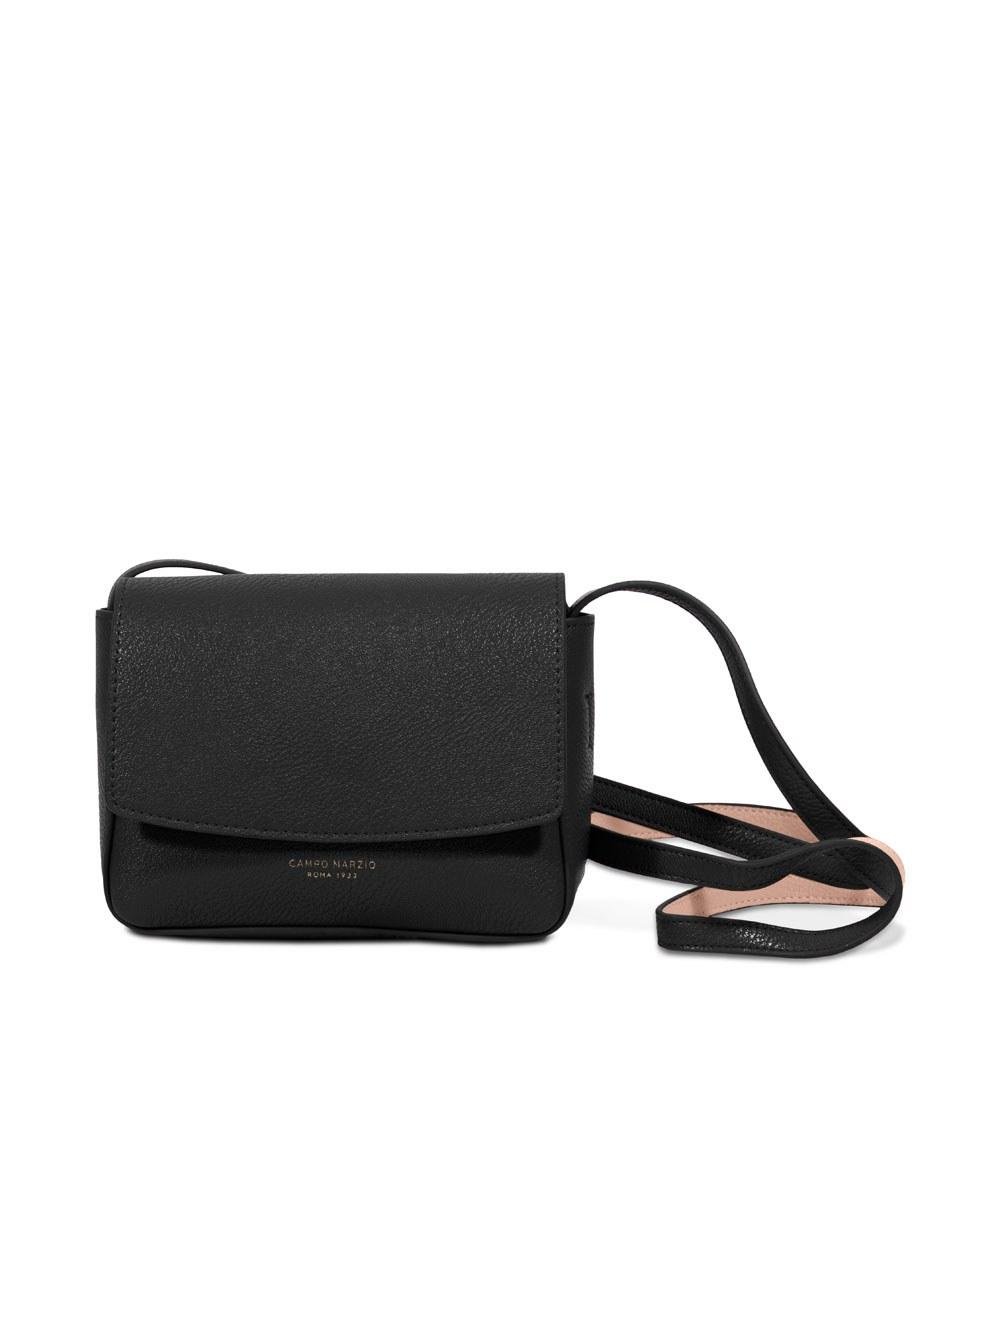 Mini Bag with Crossbody Strap - Black